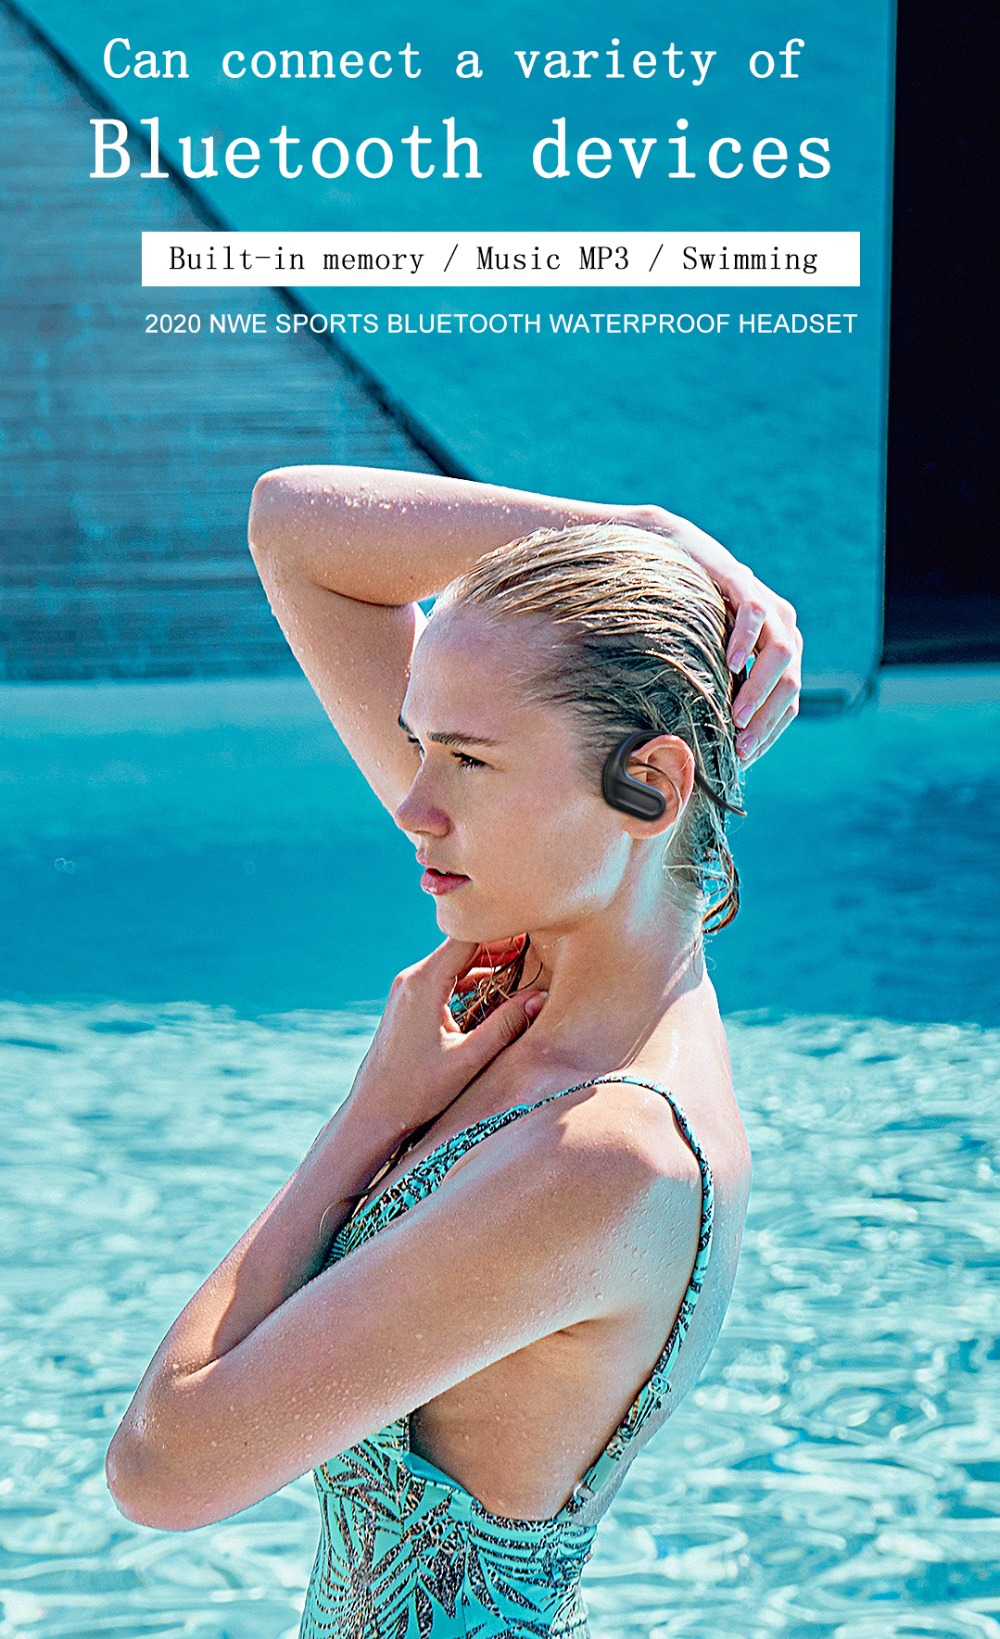 X12 headset swimming _01